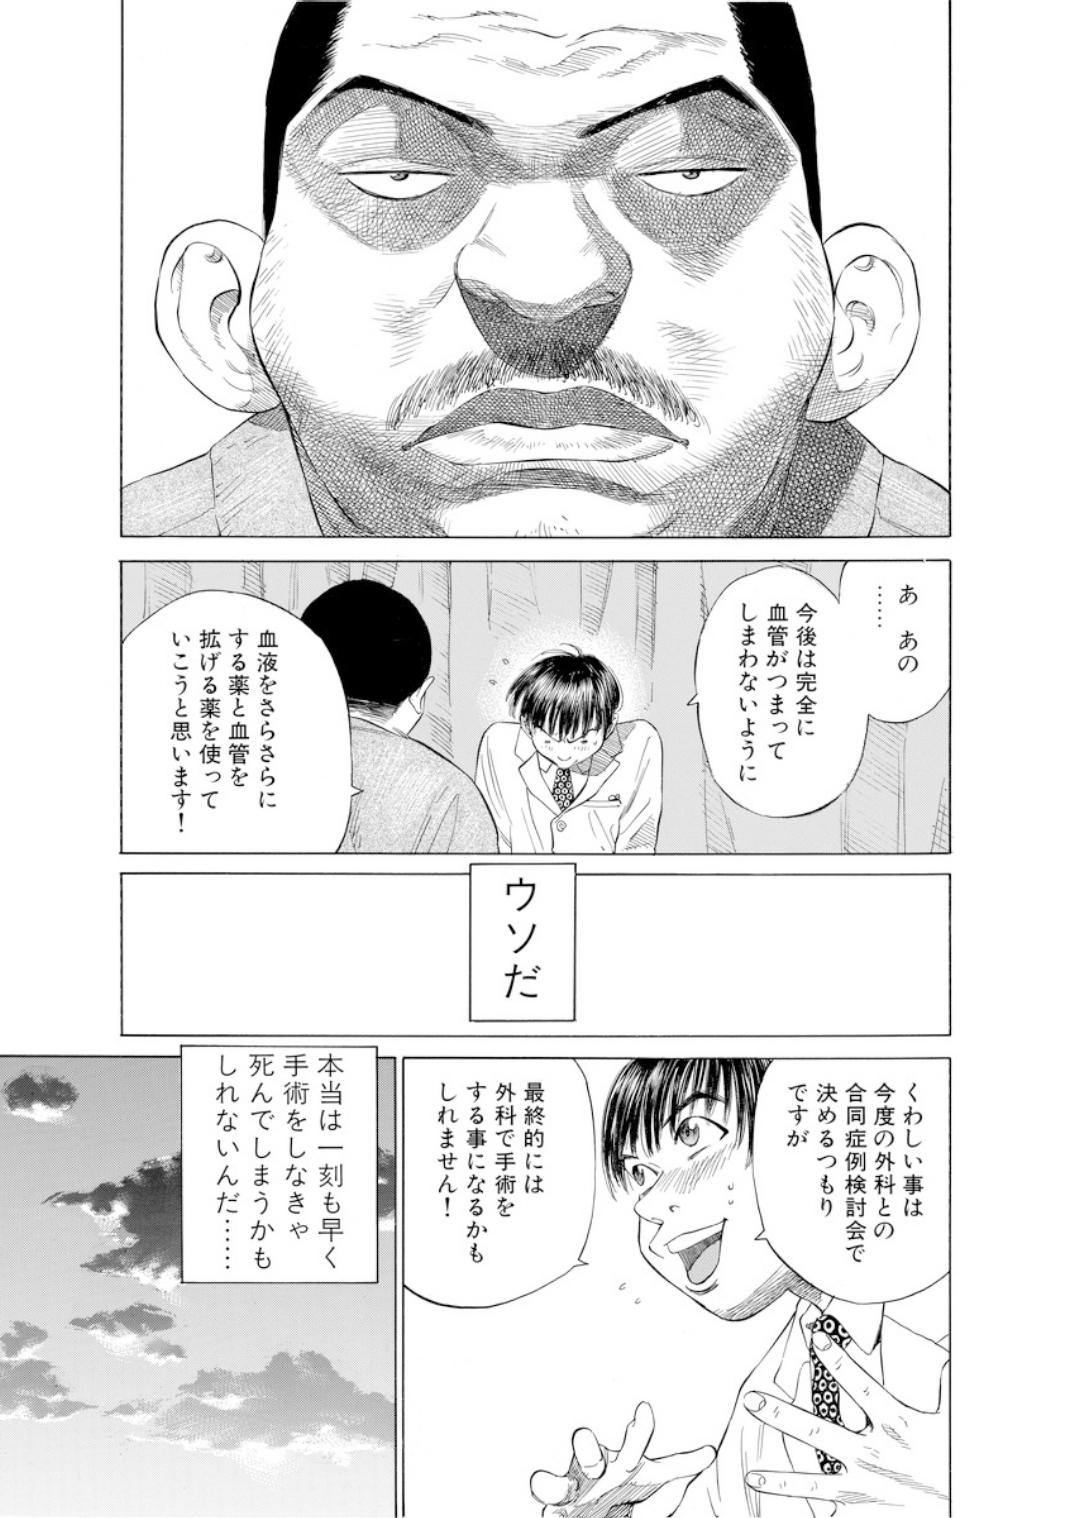 001bj_page-0177.jpg